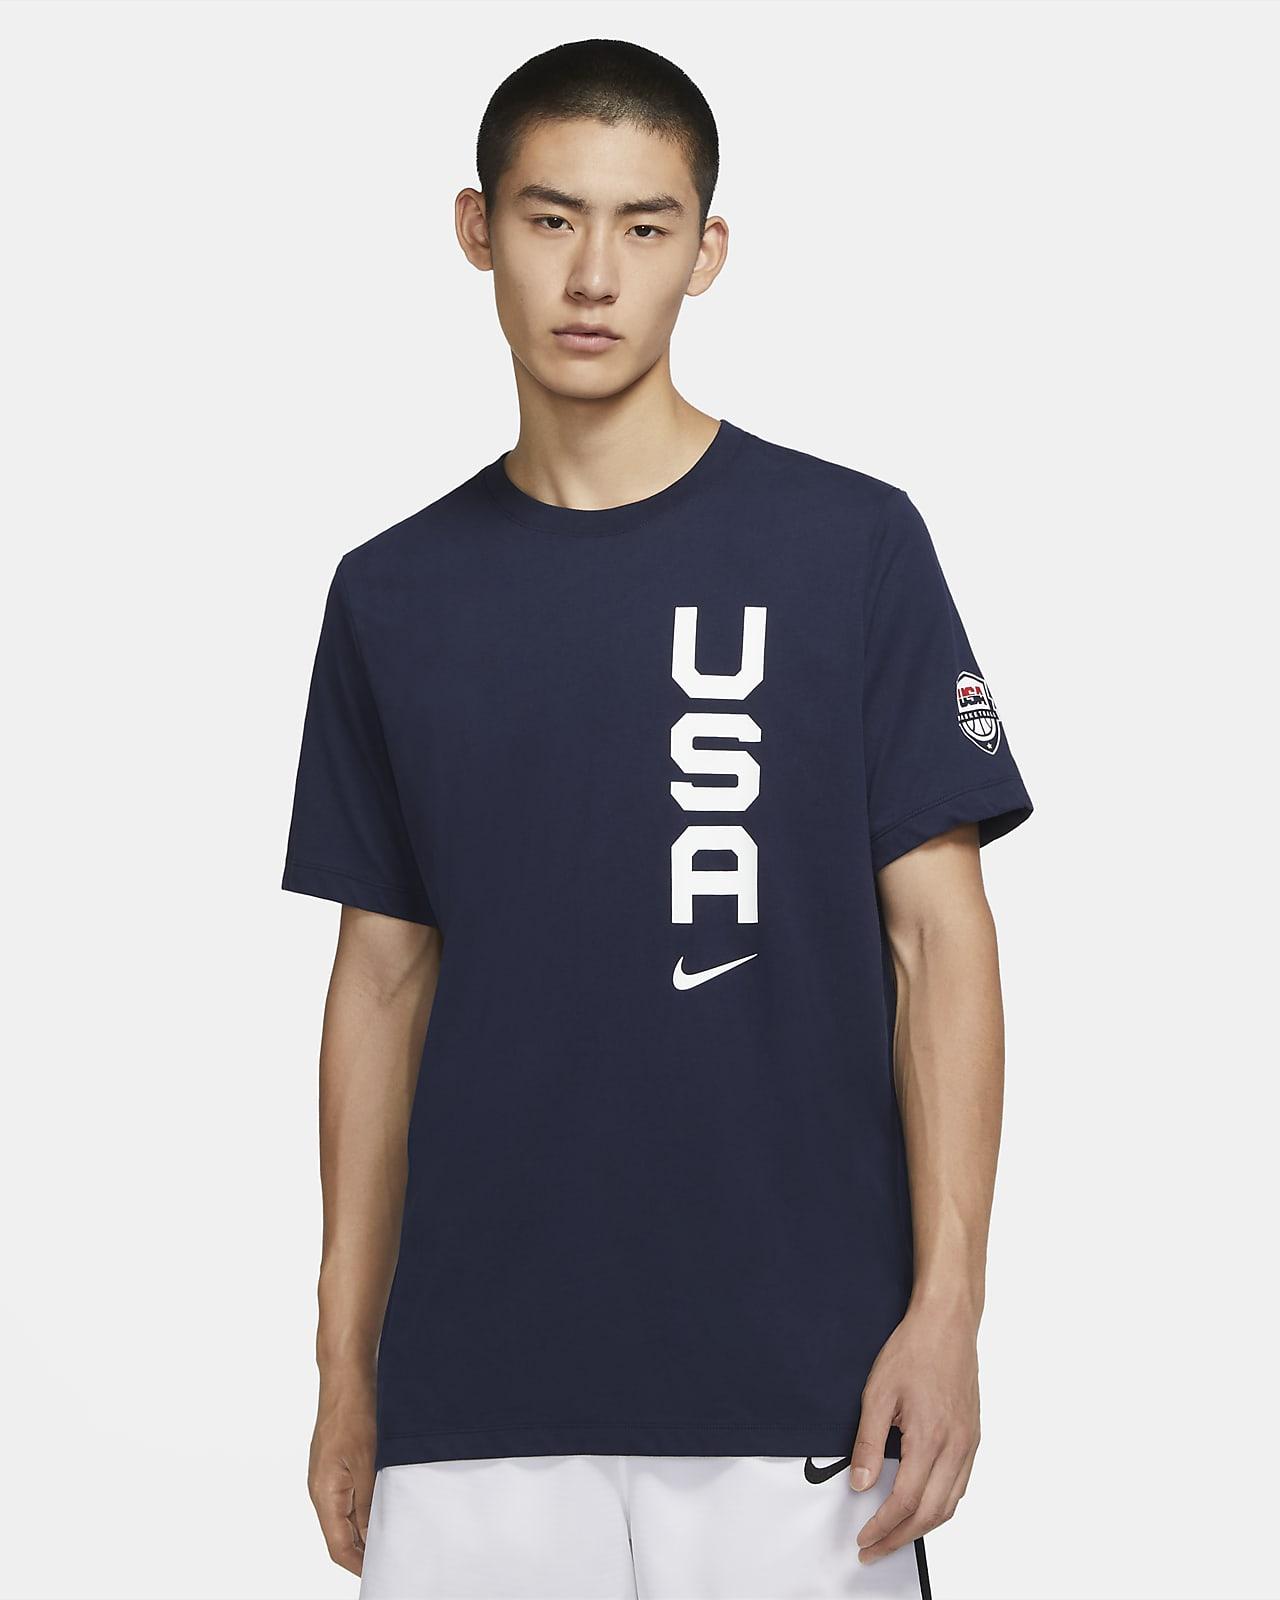 USAB Team Men's Nike Dri-FIT Basketball T-Shirt